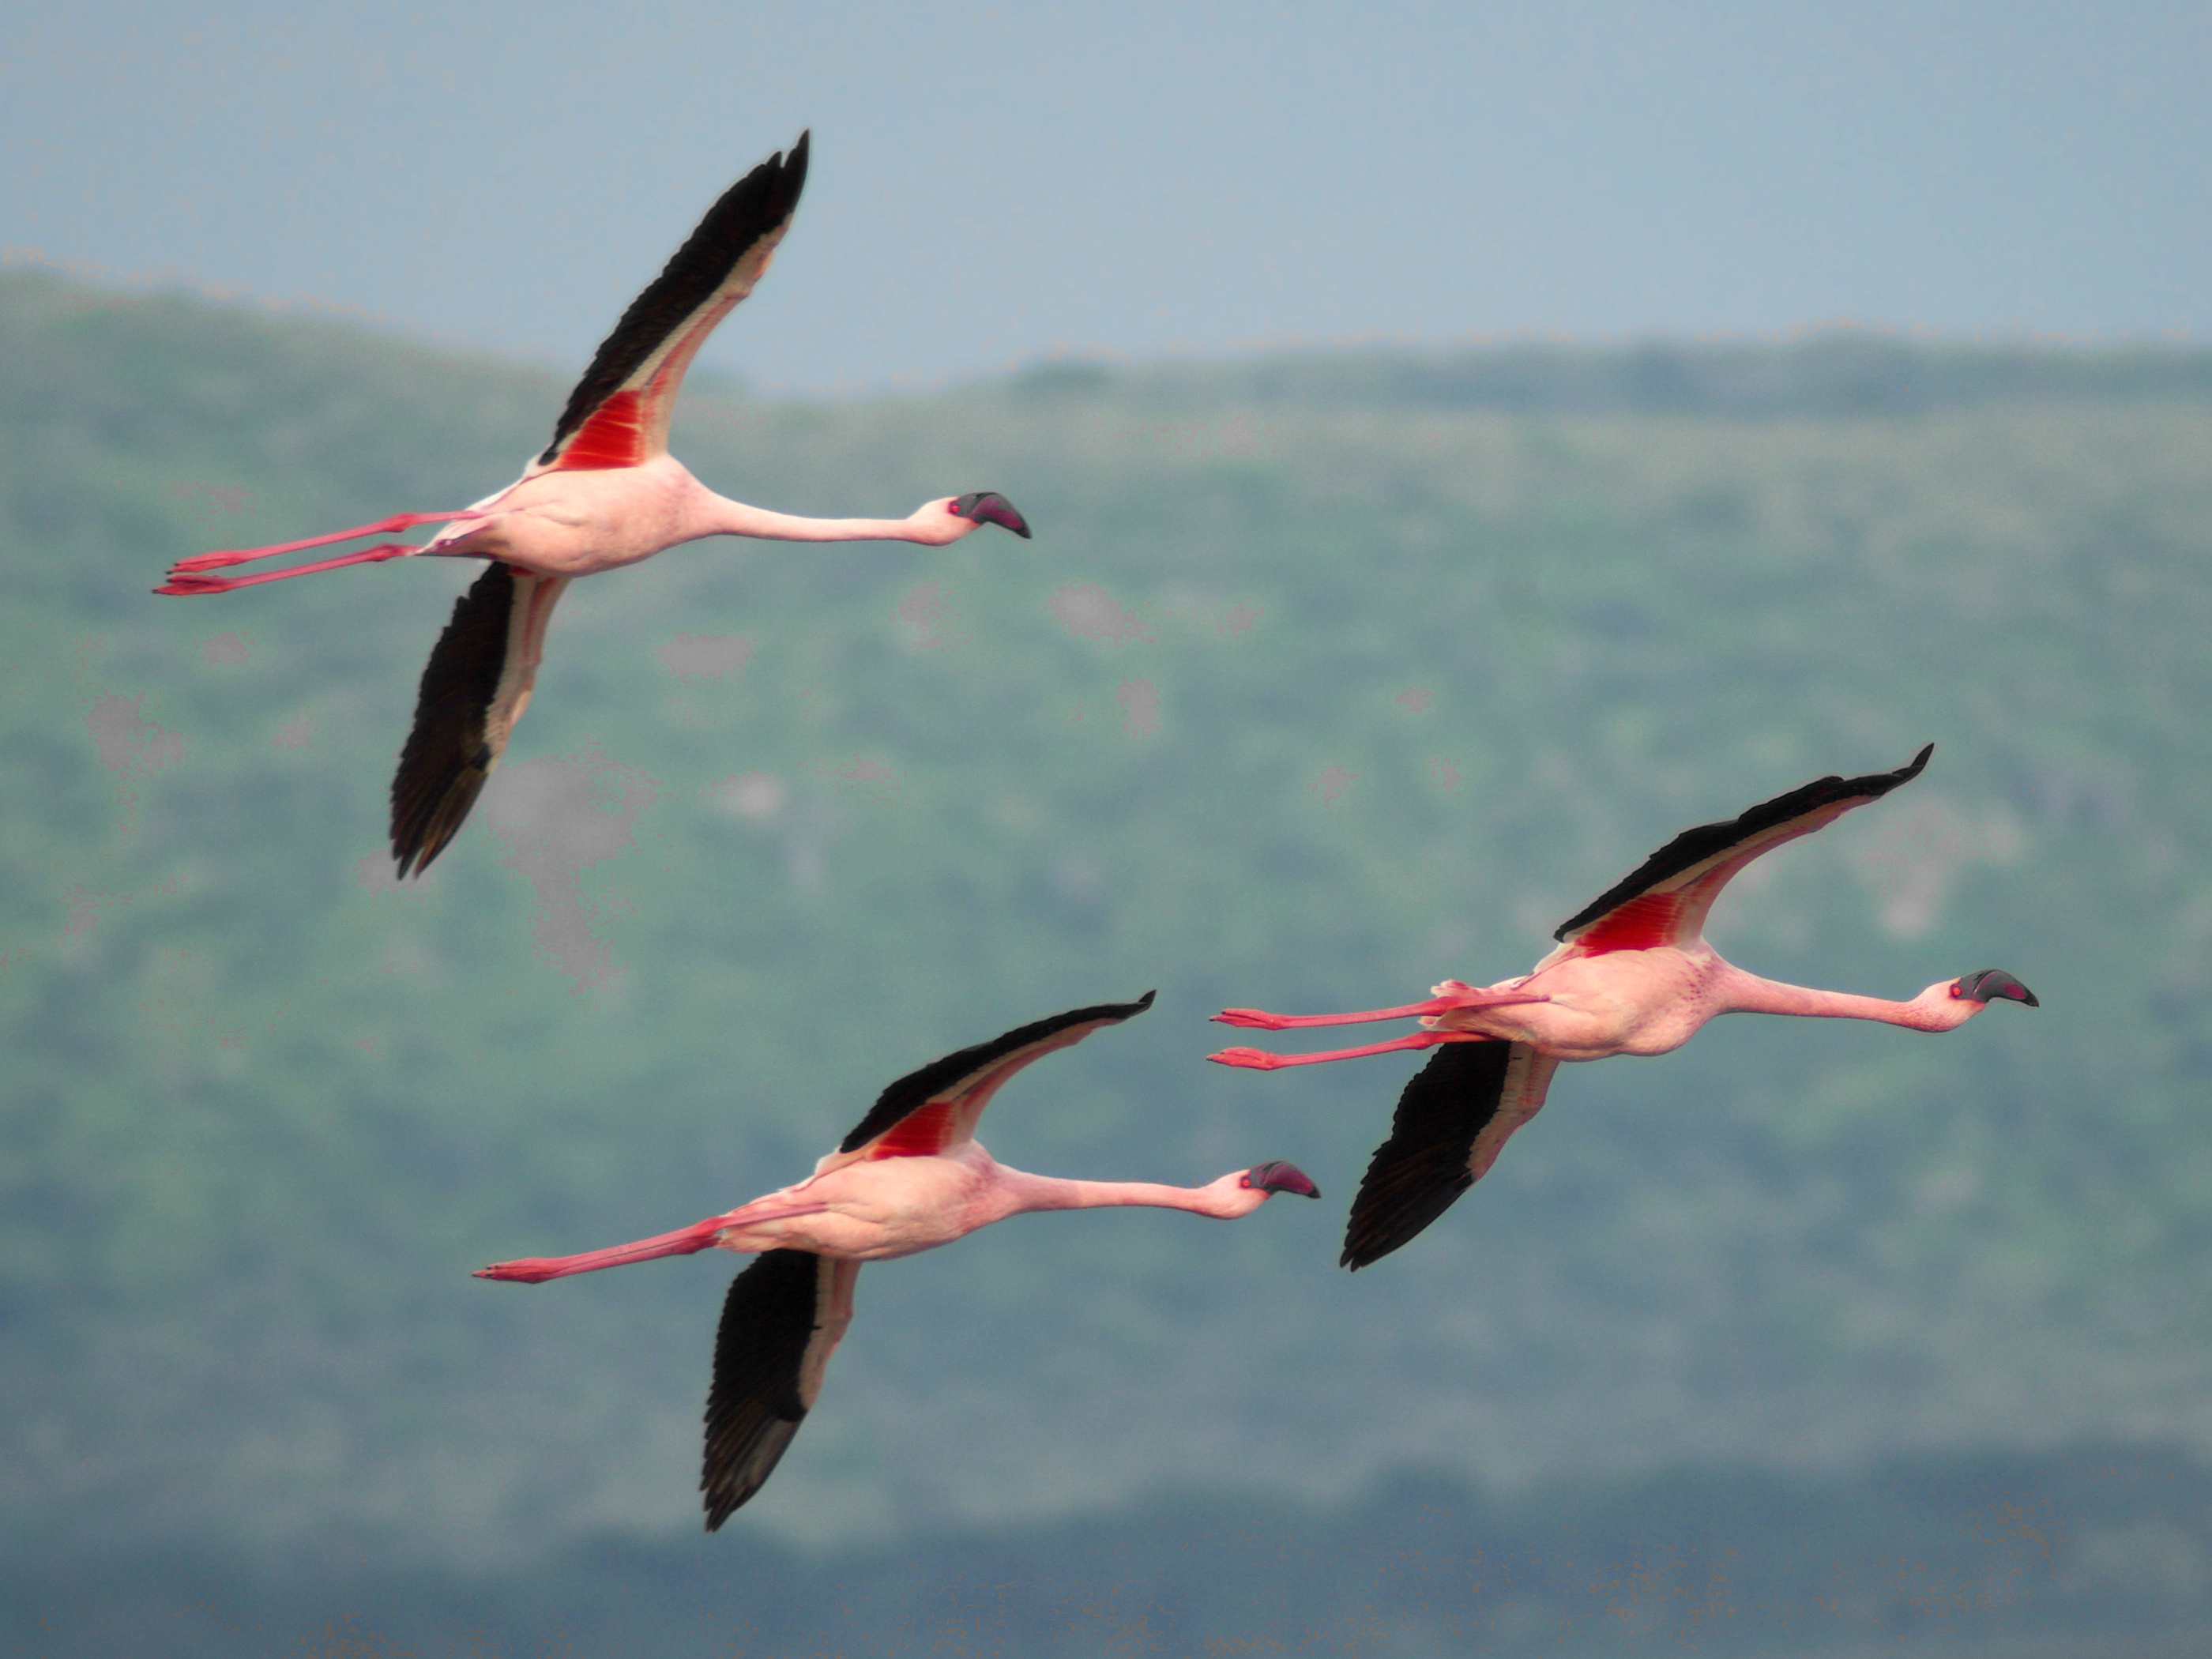 King Size Flamingo Bedding And Sheet Sets